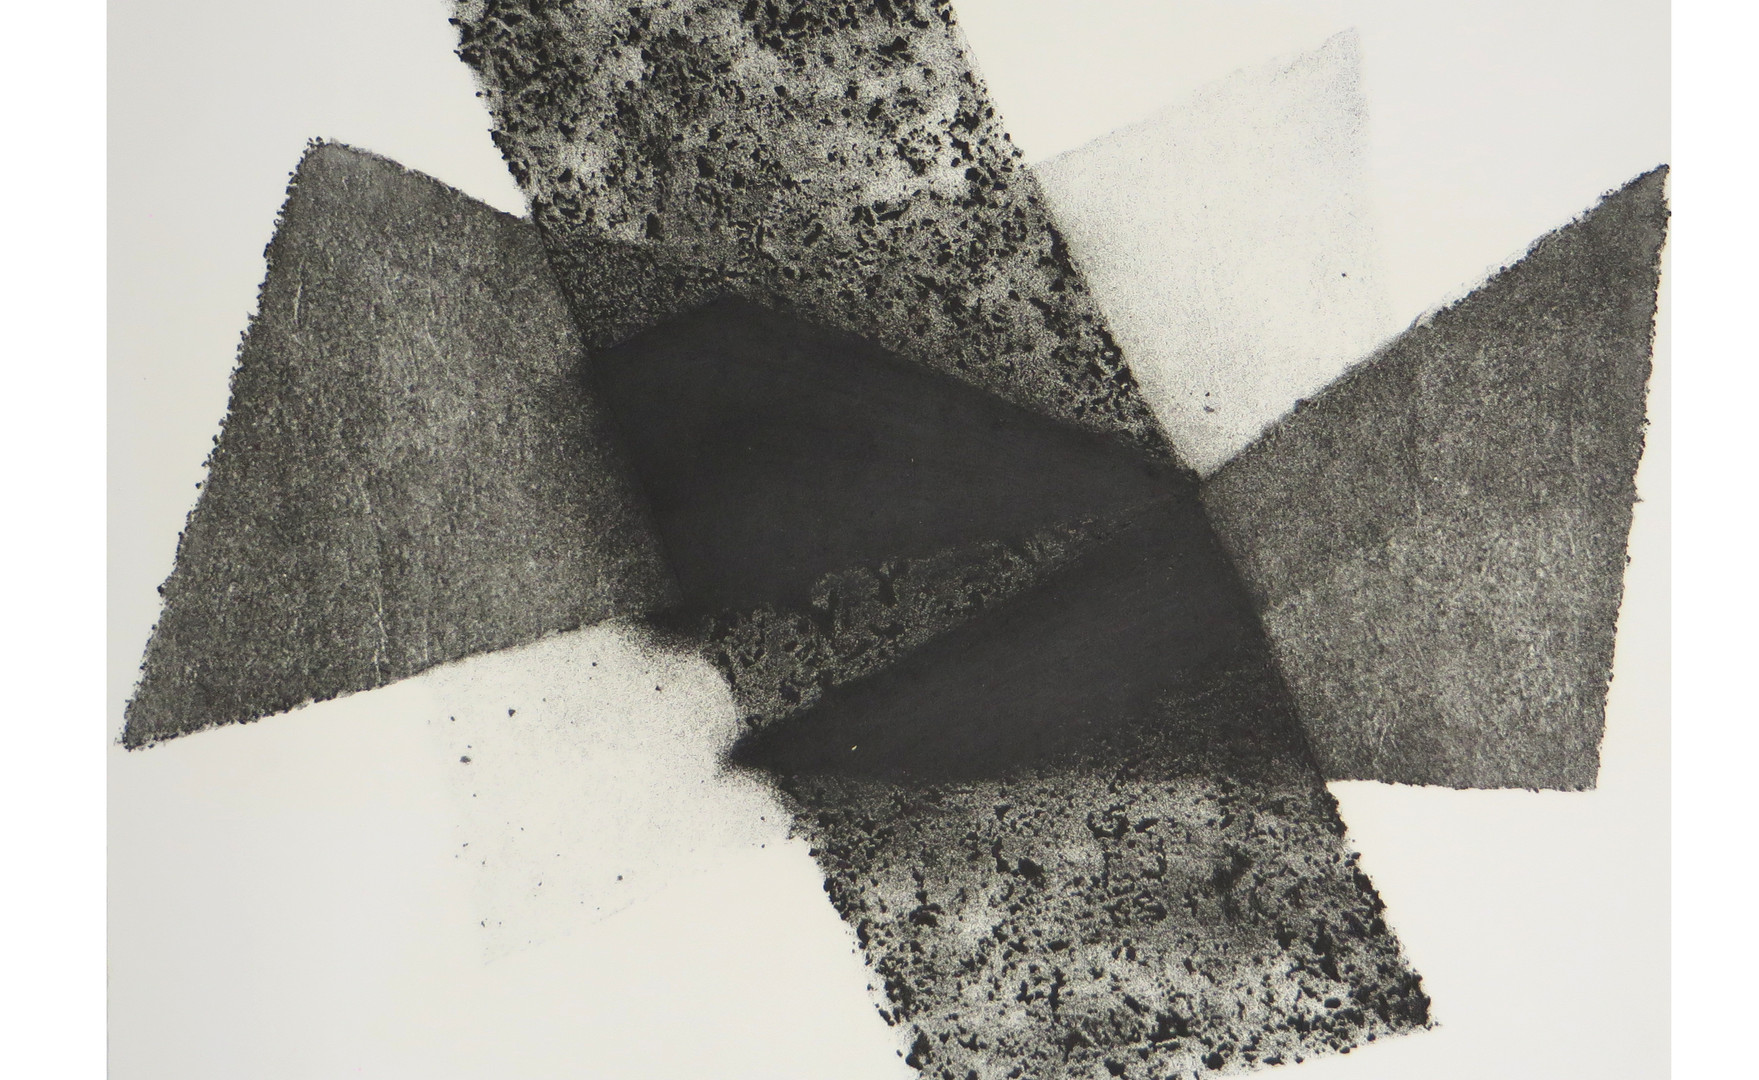 Pinuccia Bernardoni, Rossaura, 1977